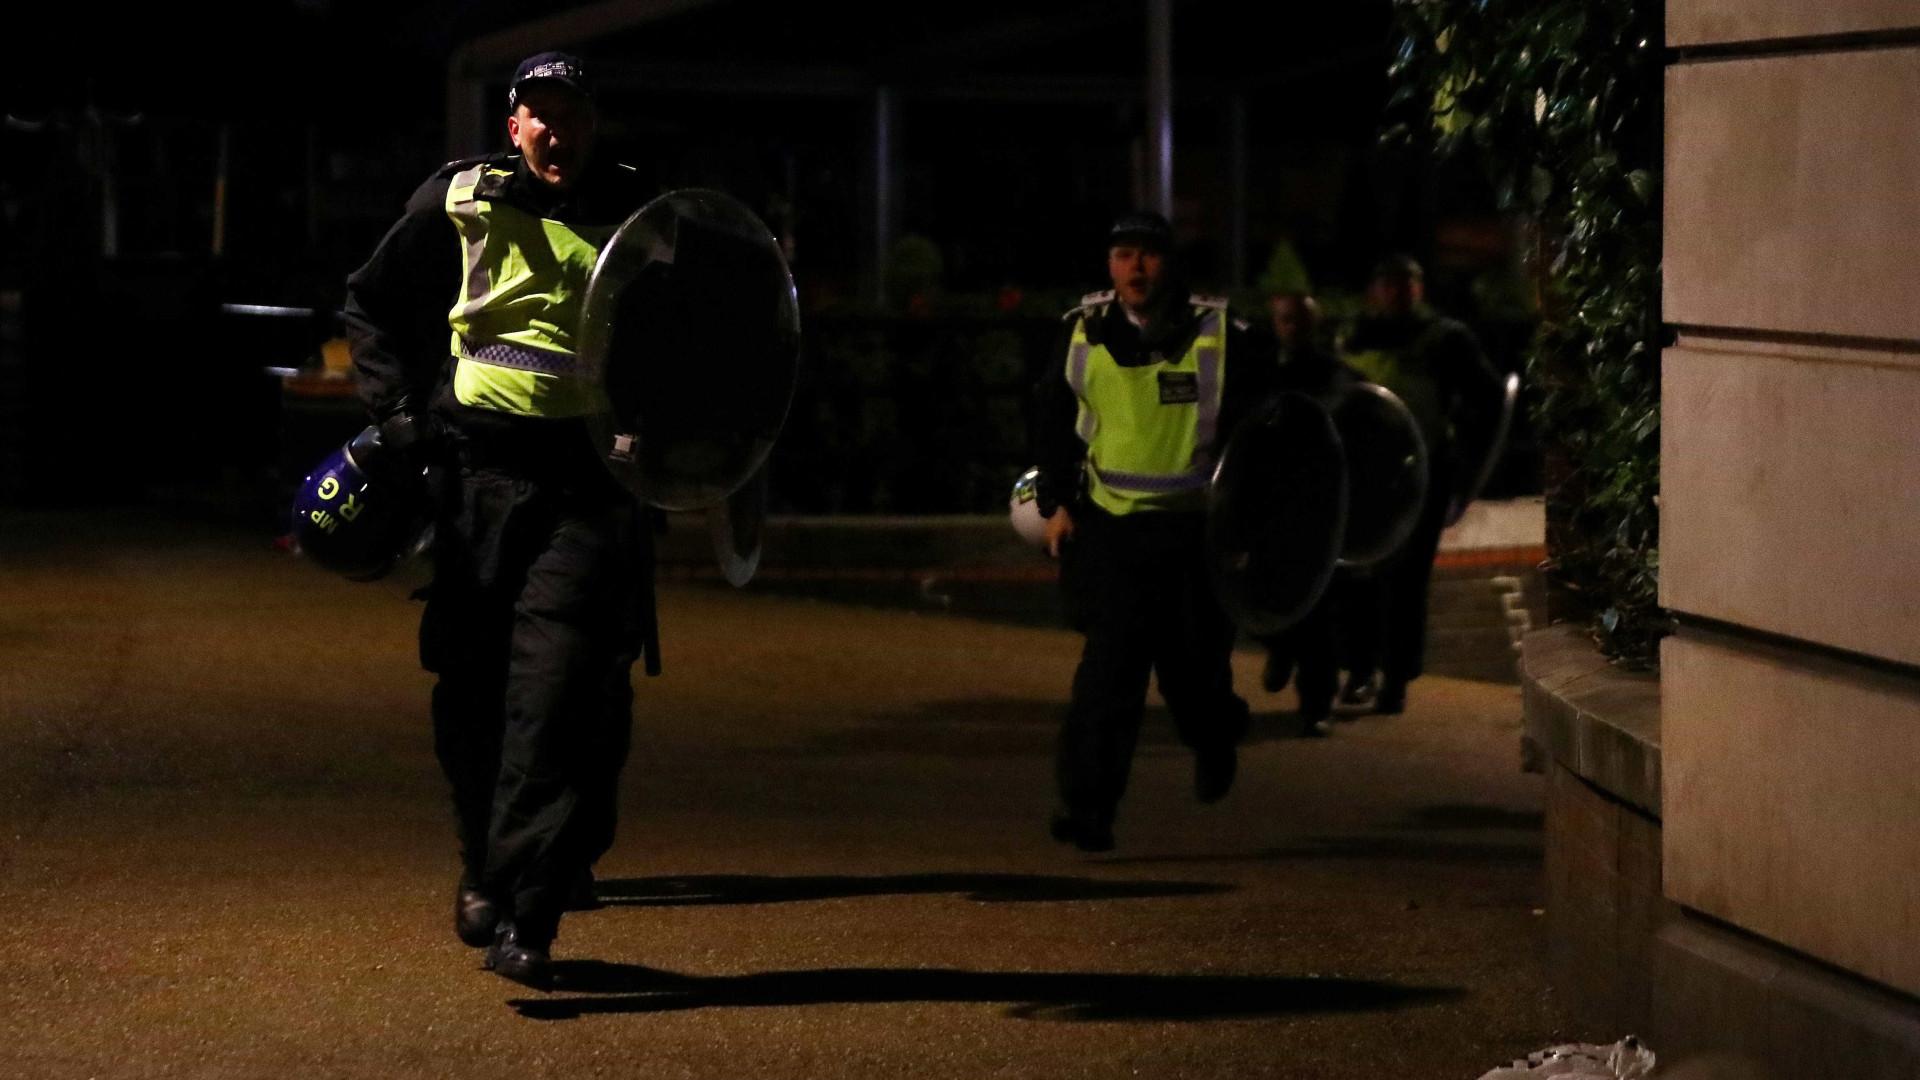 Incidente na London Bridge deixa várias vítimas